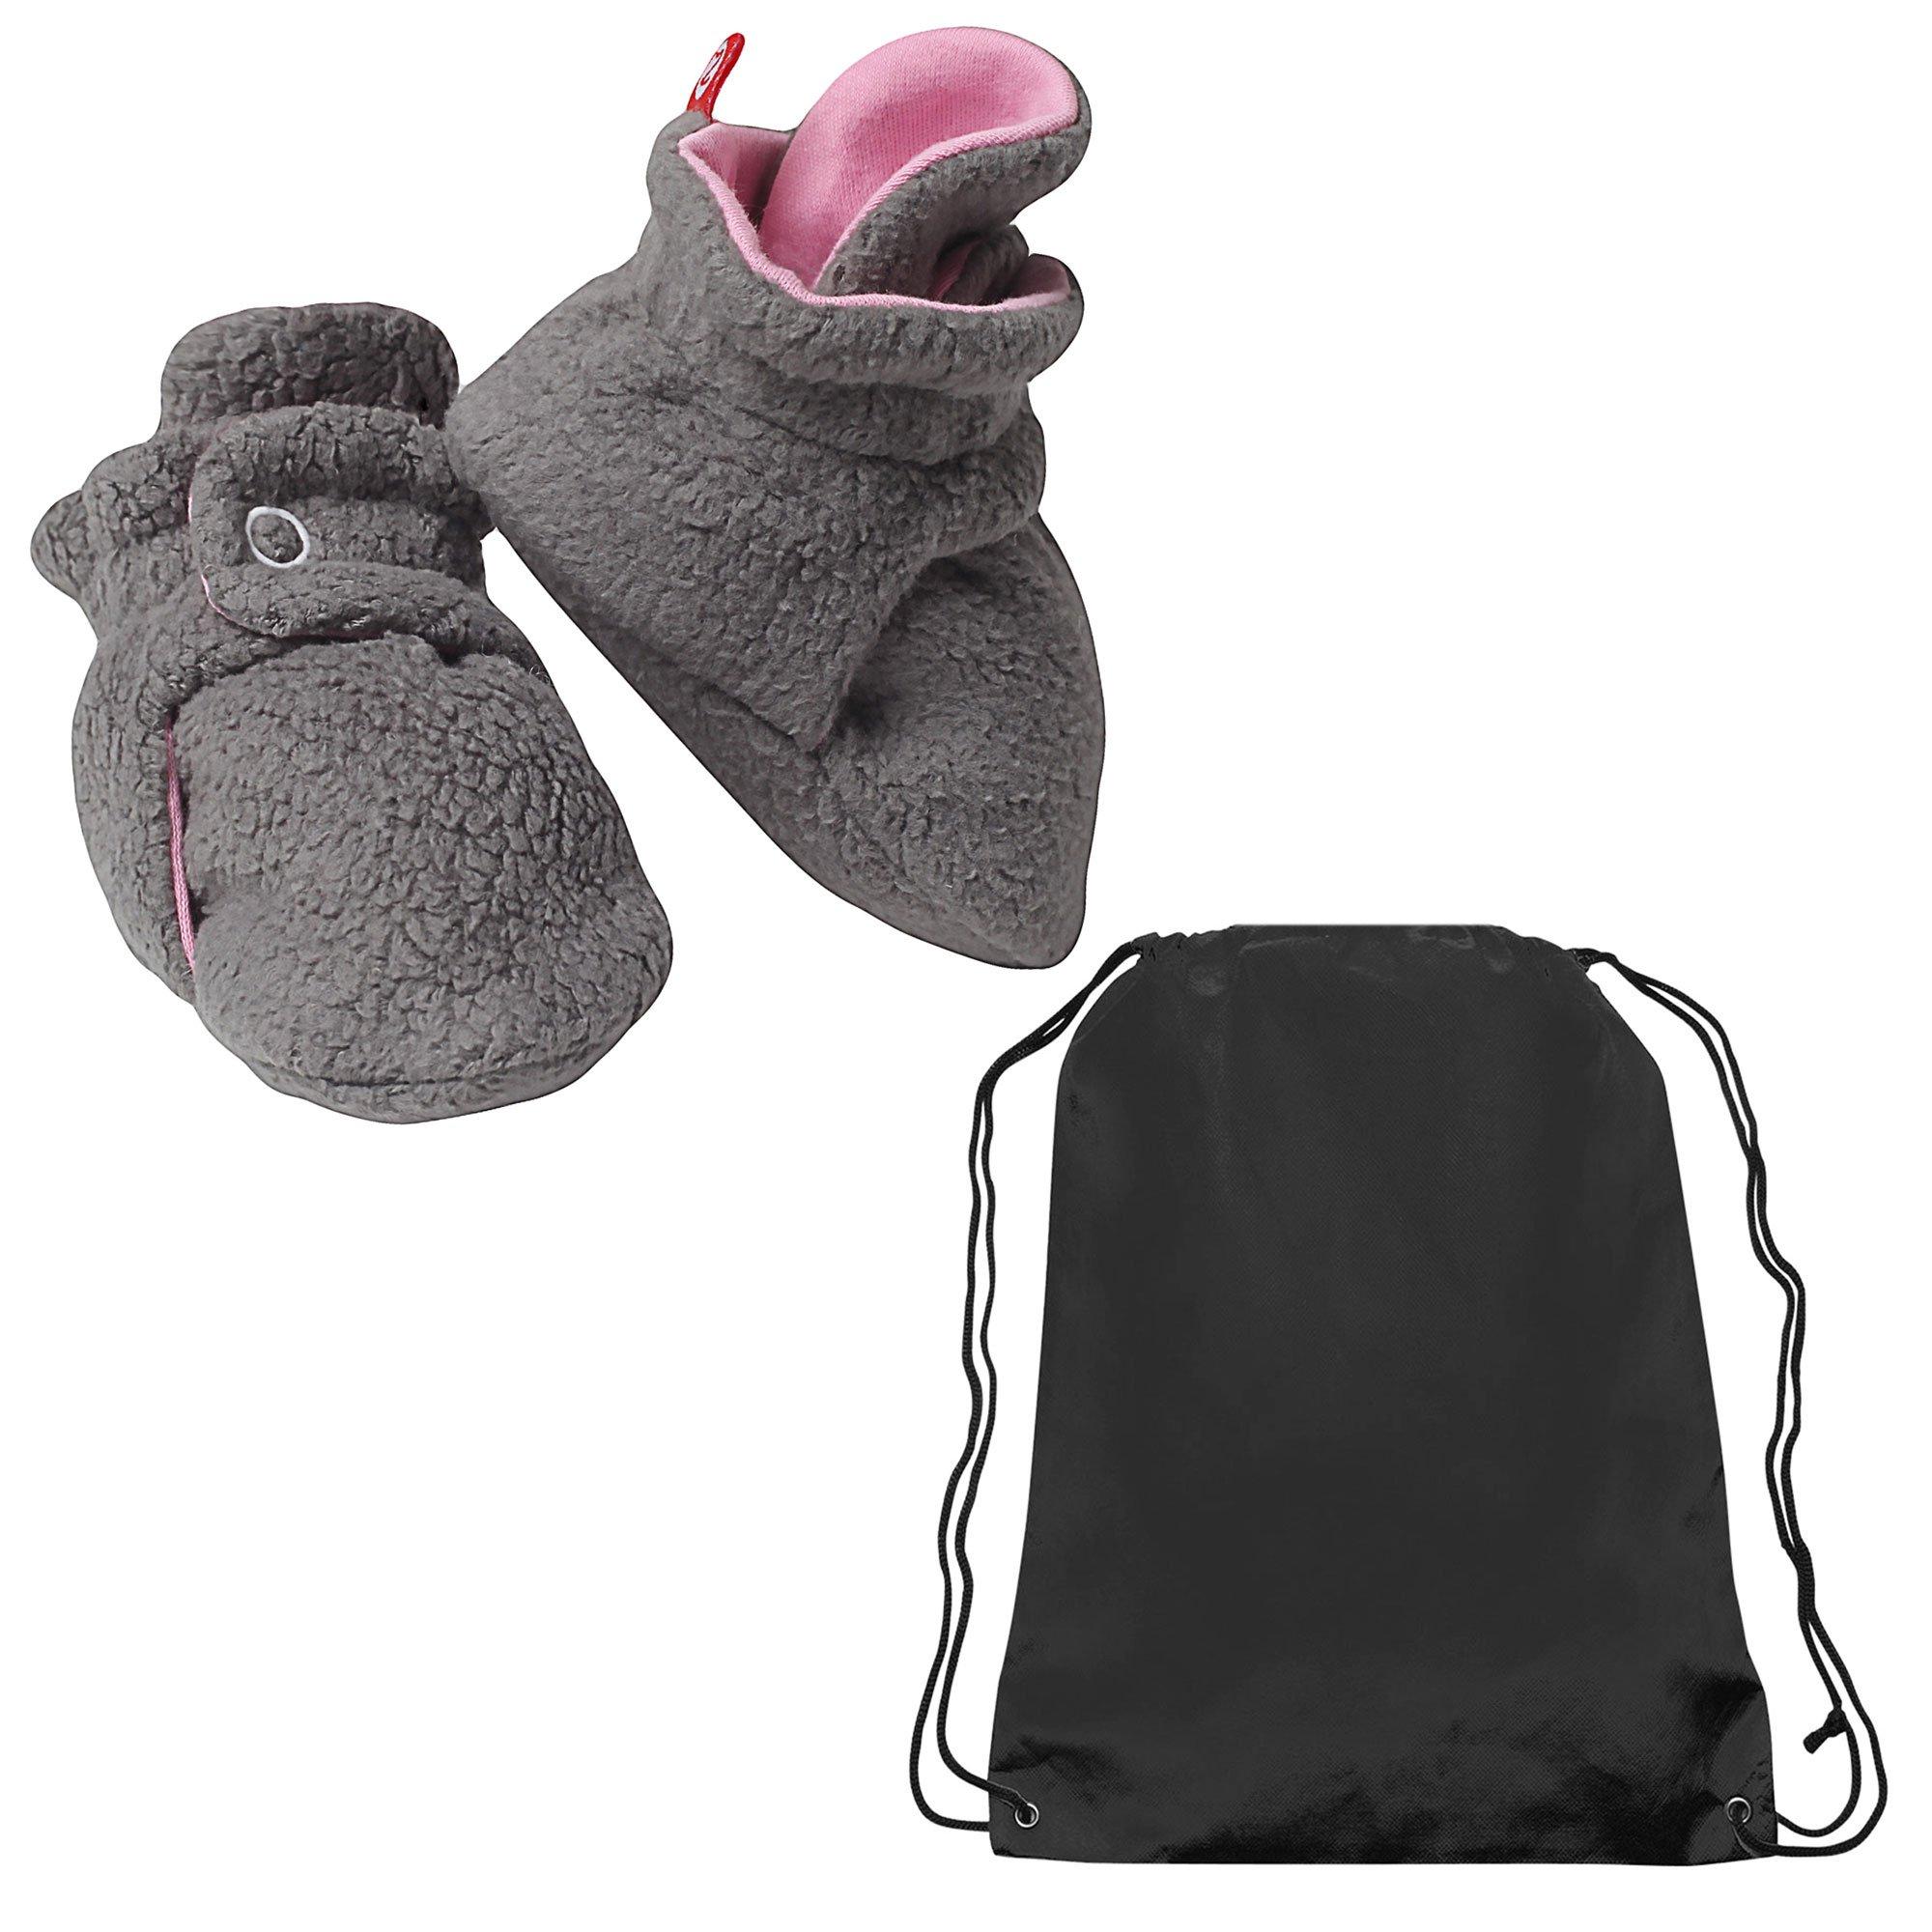 Zutano Booties Baby Girls Fleece Slipper Socks and Toy Bag Gray / Pink 12 Mth by Zutano